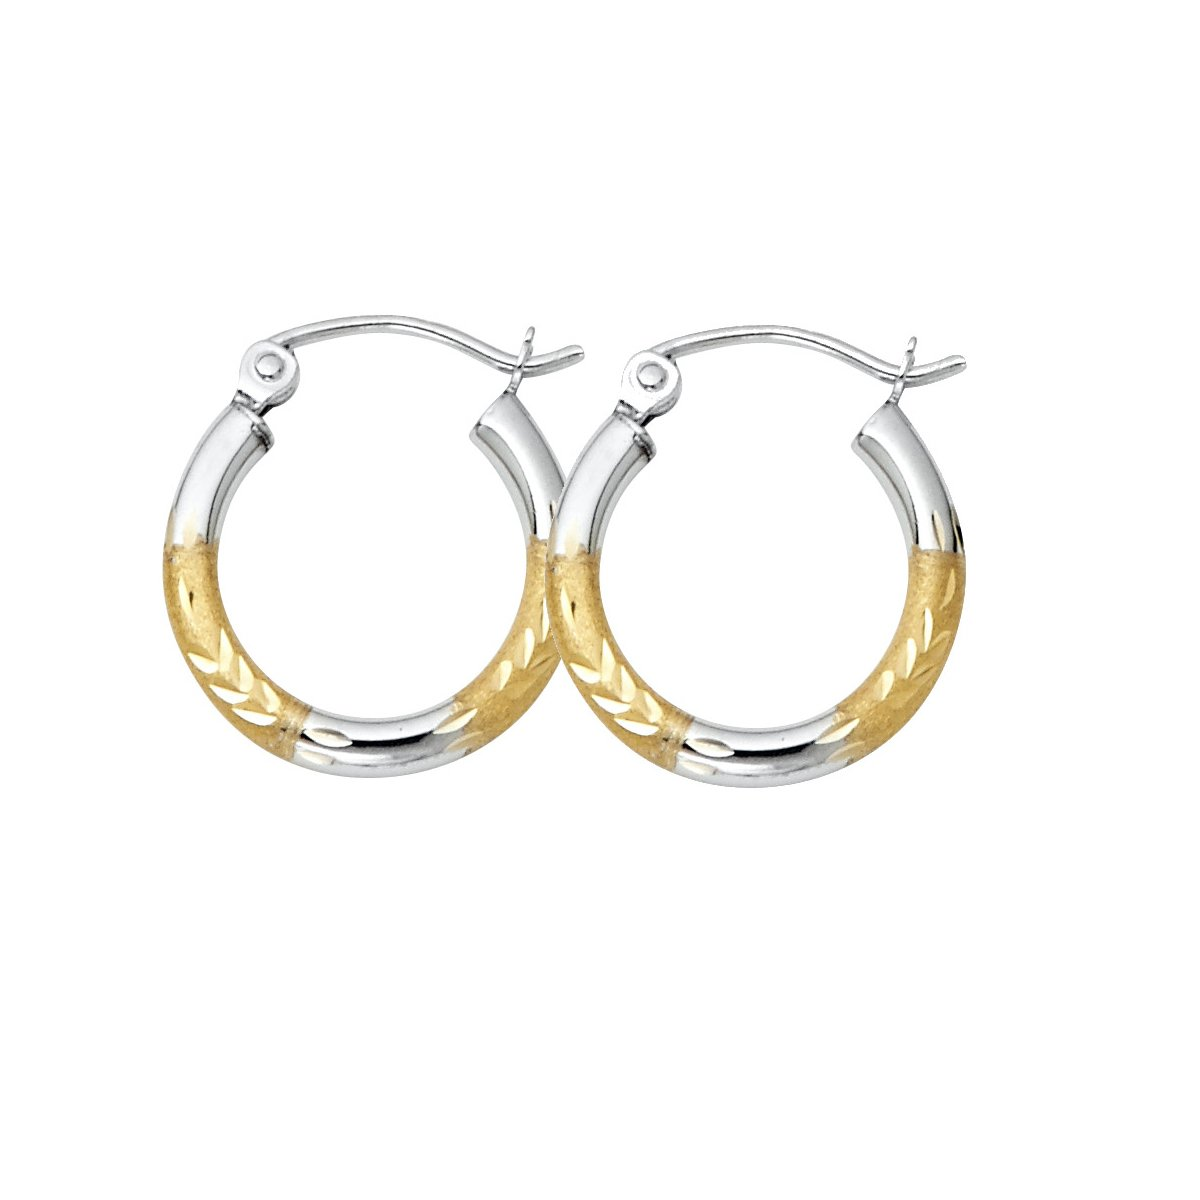 Diameter - 15 MM 14K Yellow Gold 2mm Diamond Cut Hoop Earrings